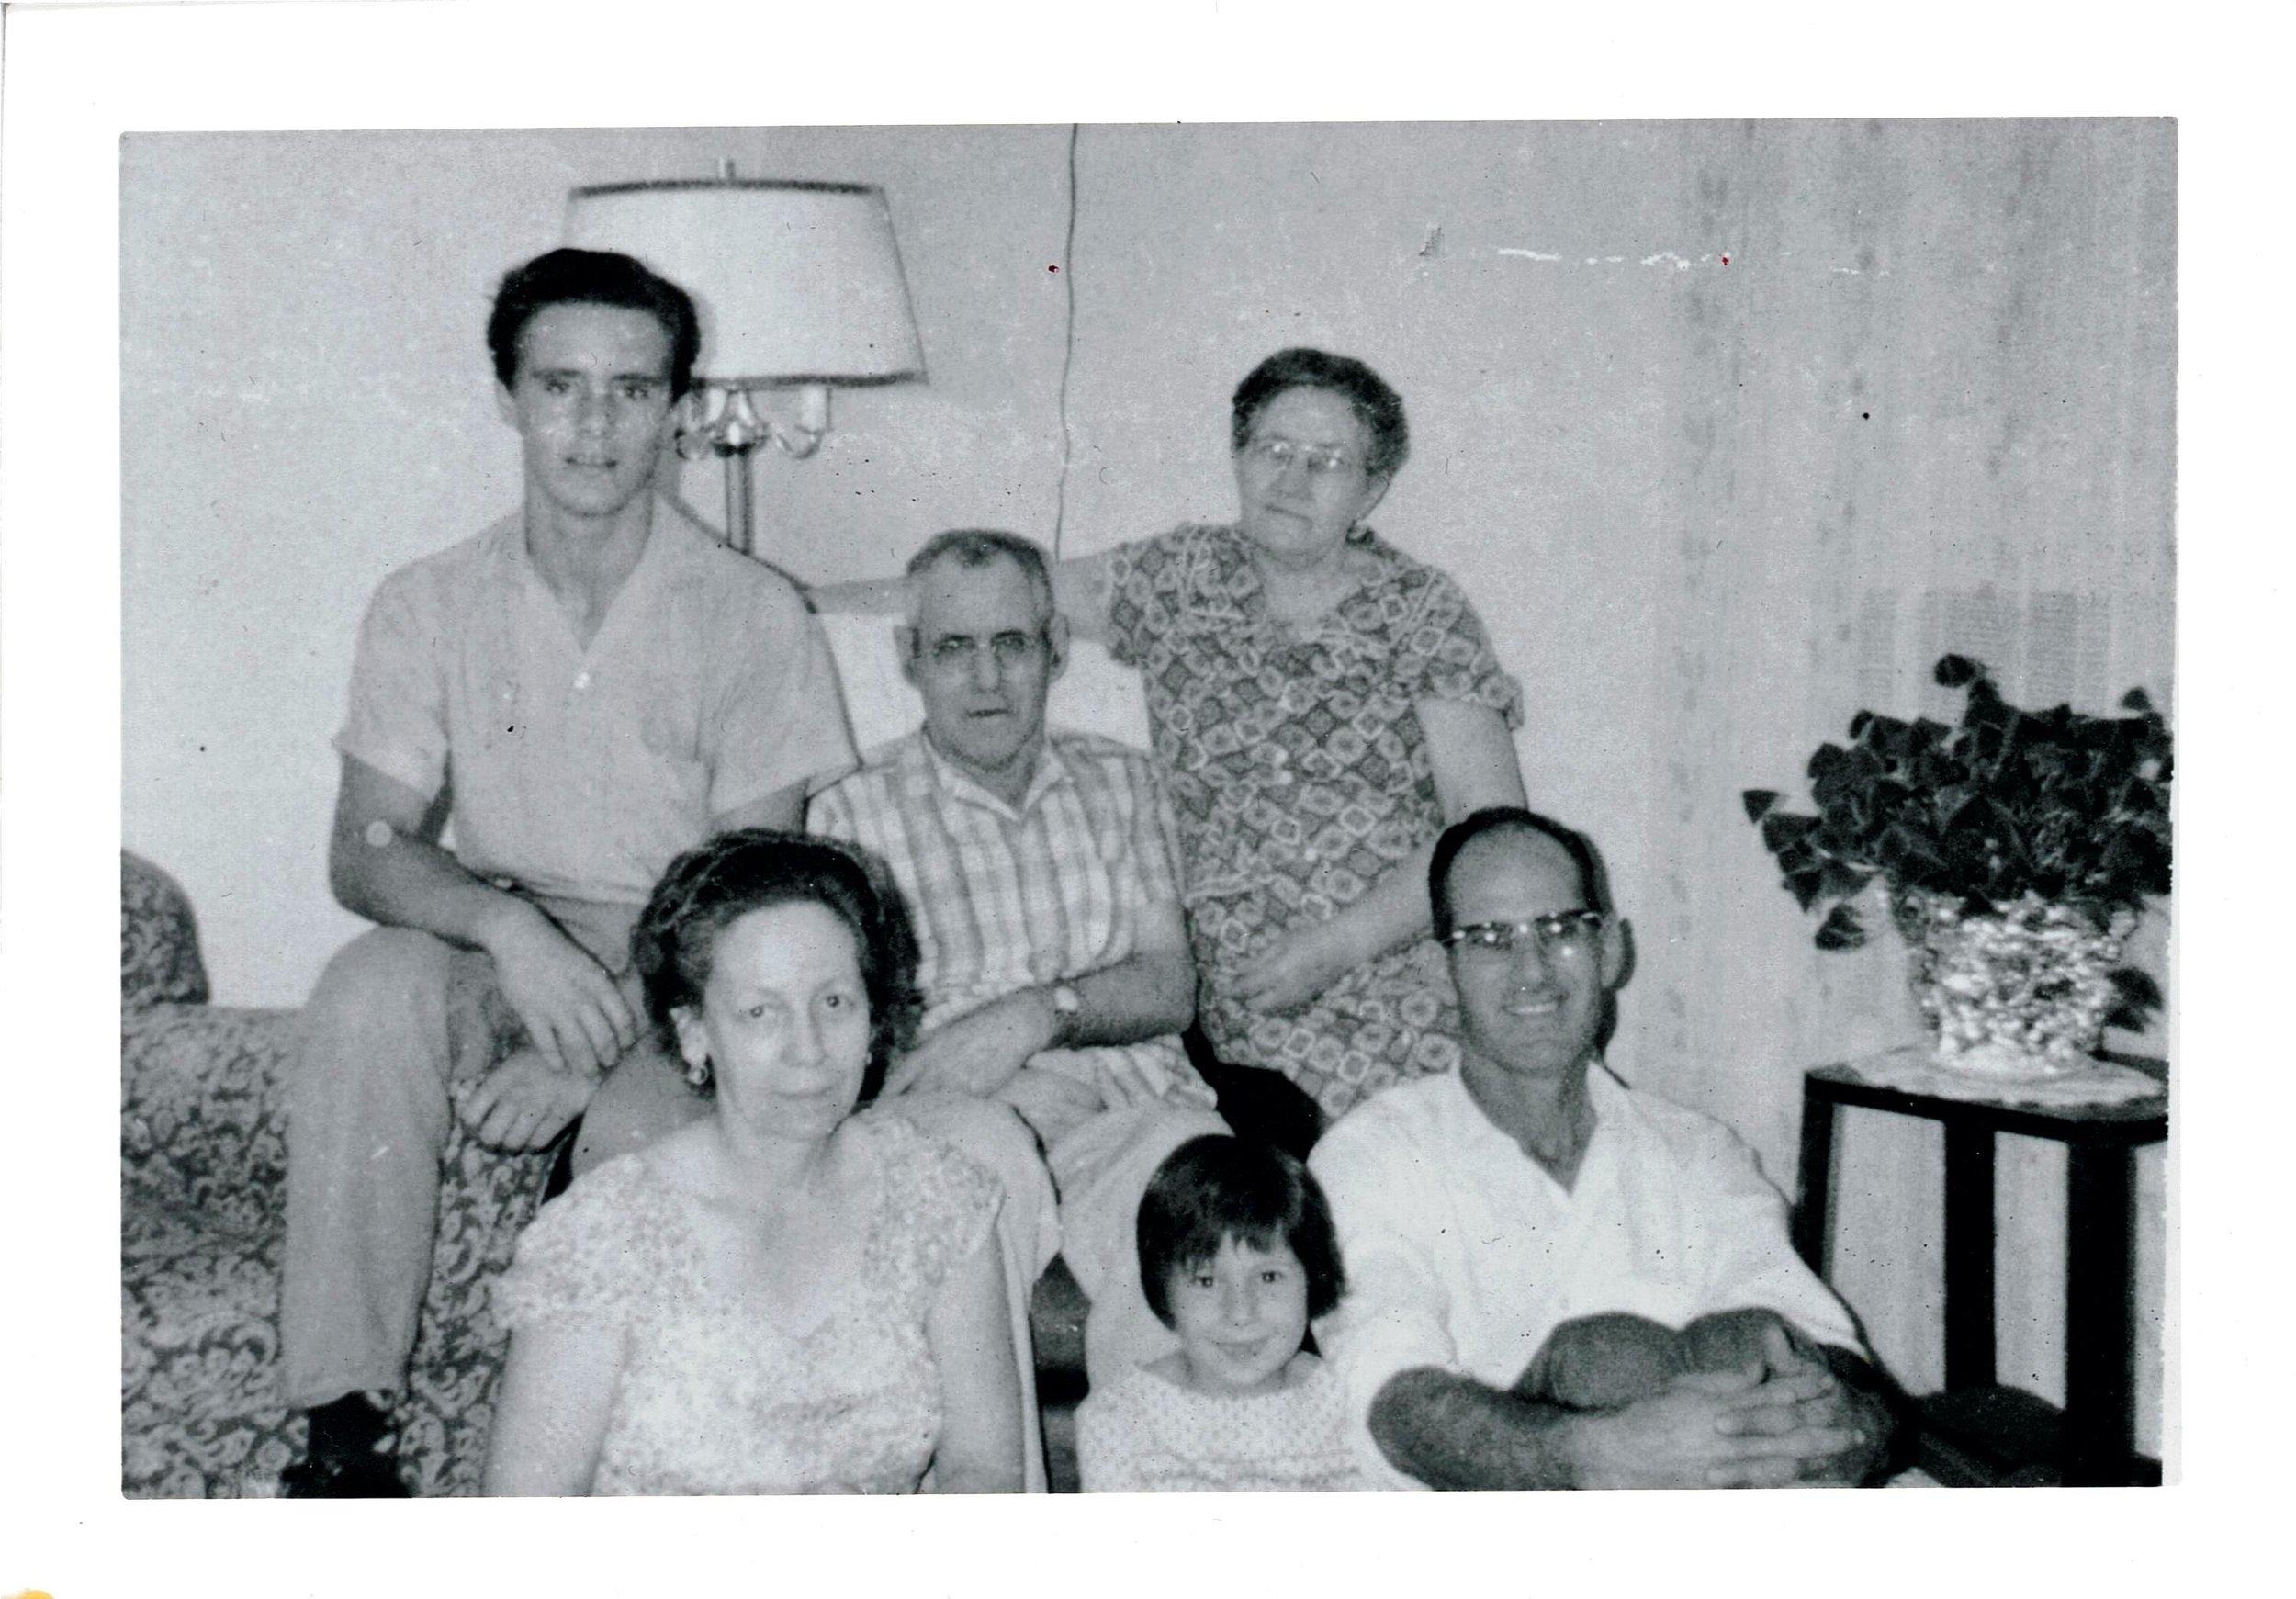 With Grandpa & Grandma 1965.jpeg